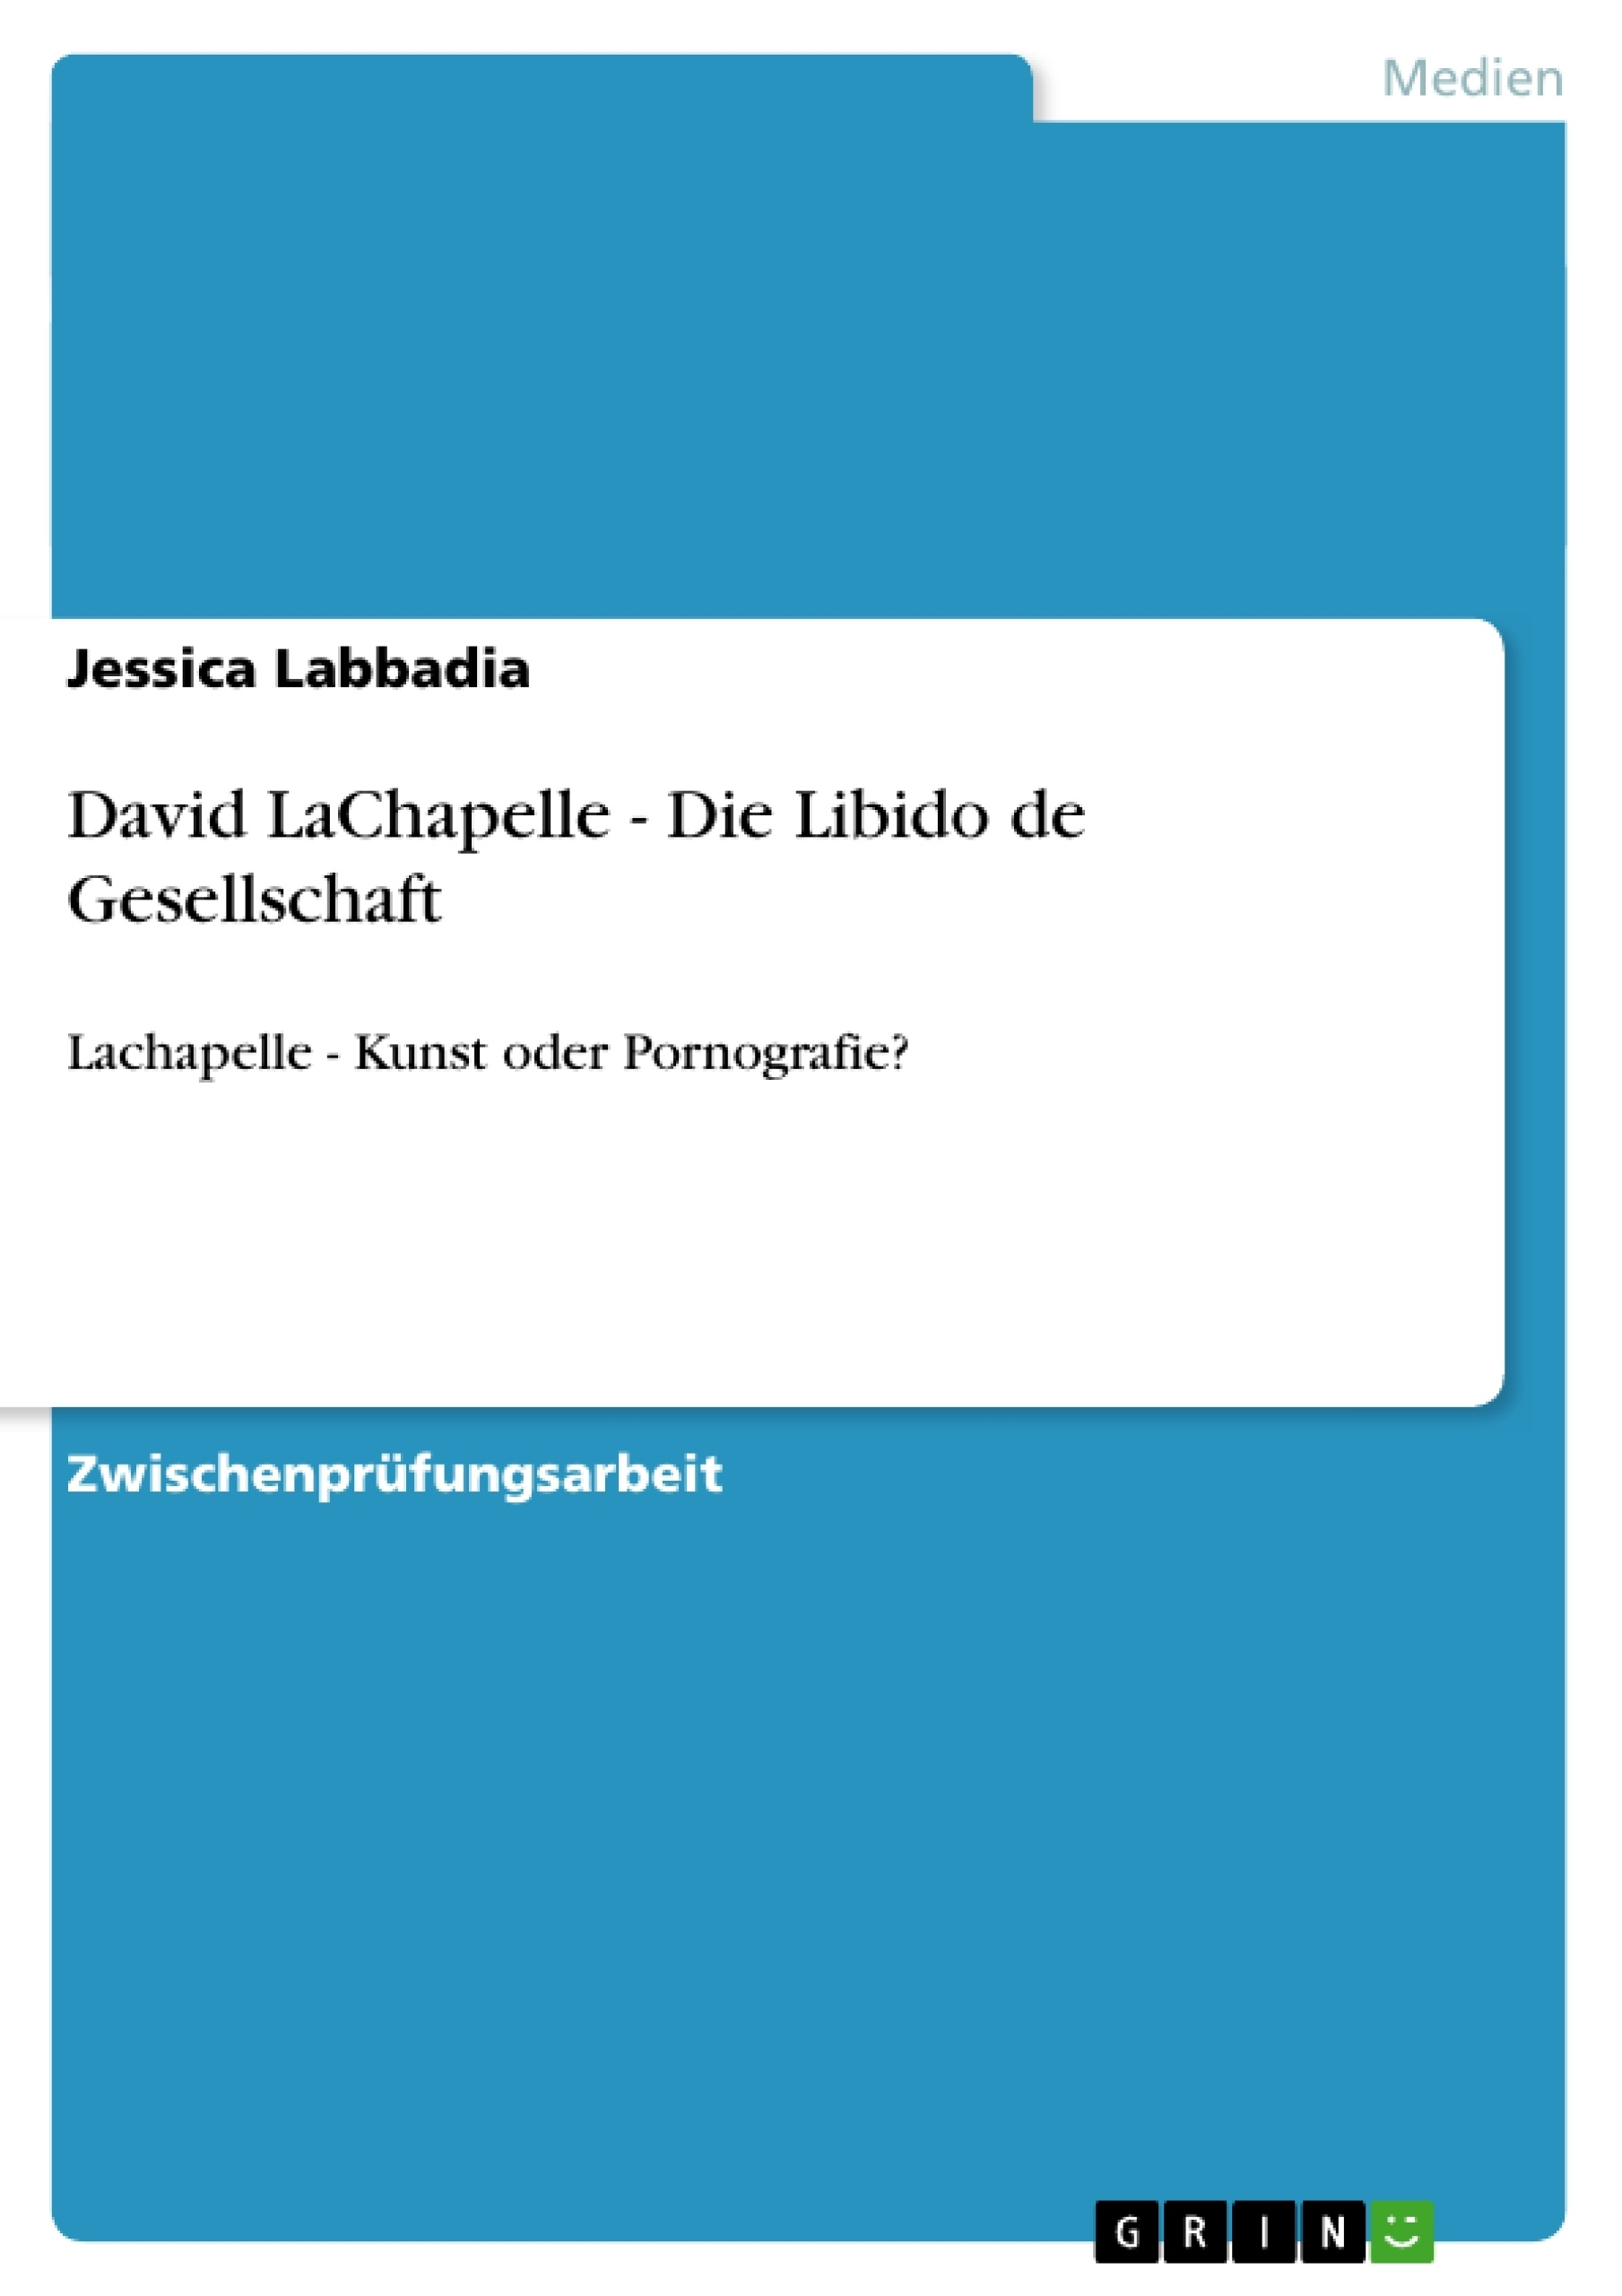 Titel: David LaChapelle - Die Libido de Gesellschaft